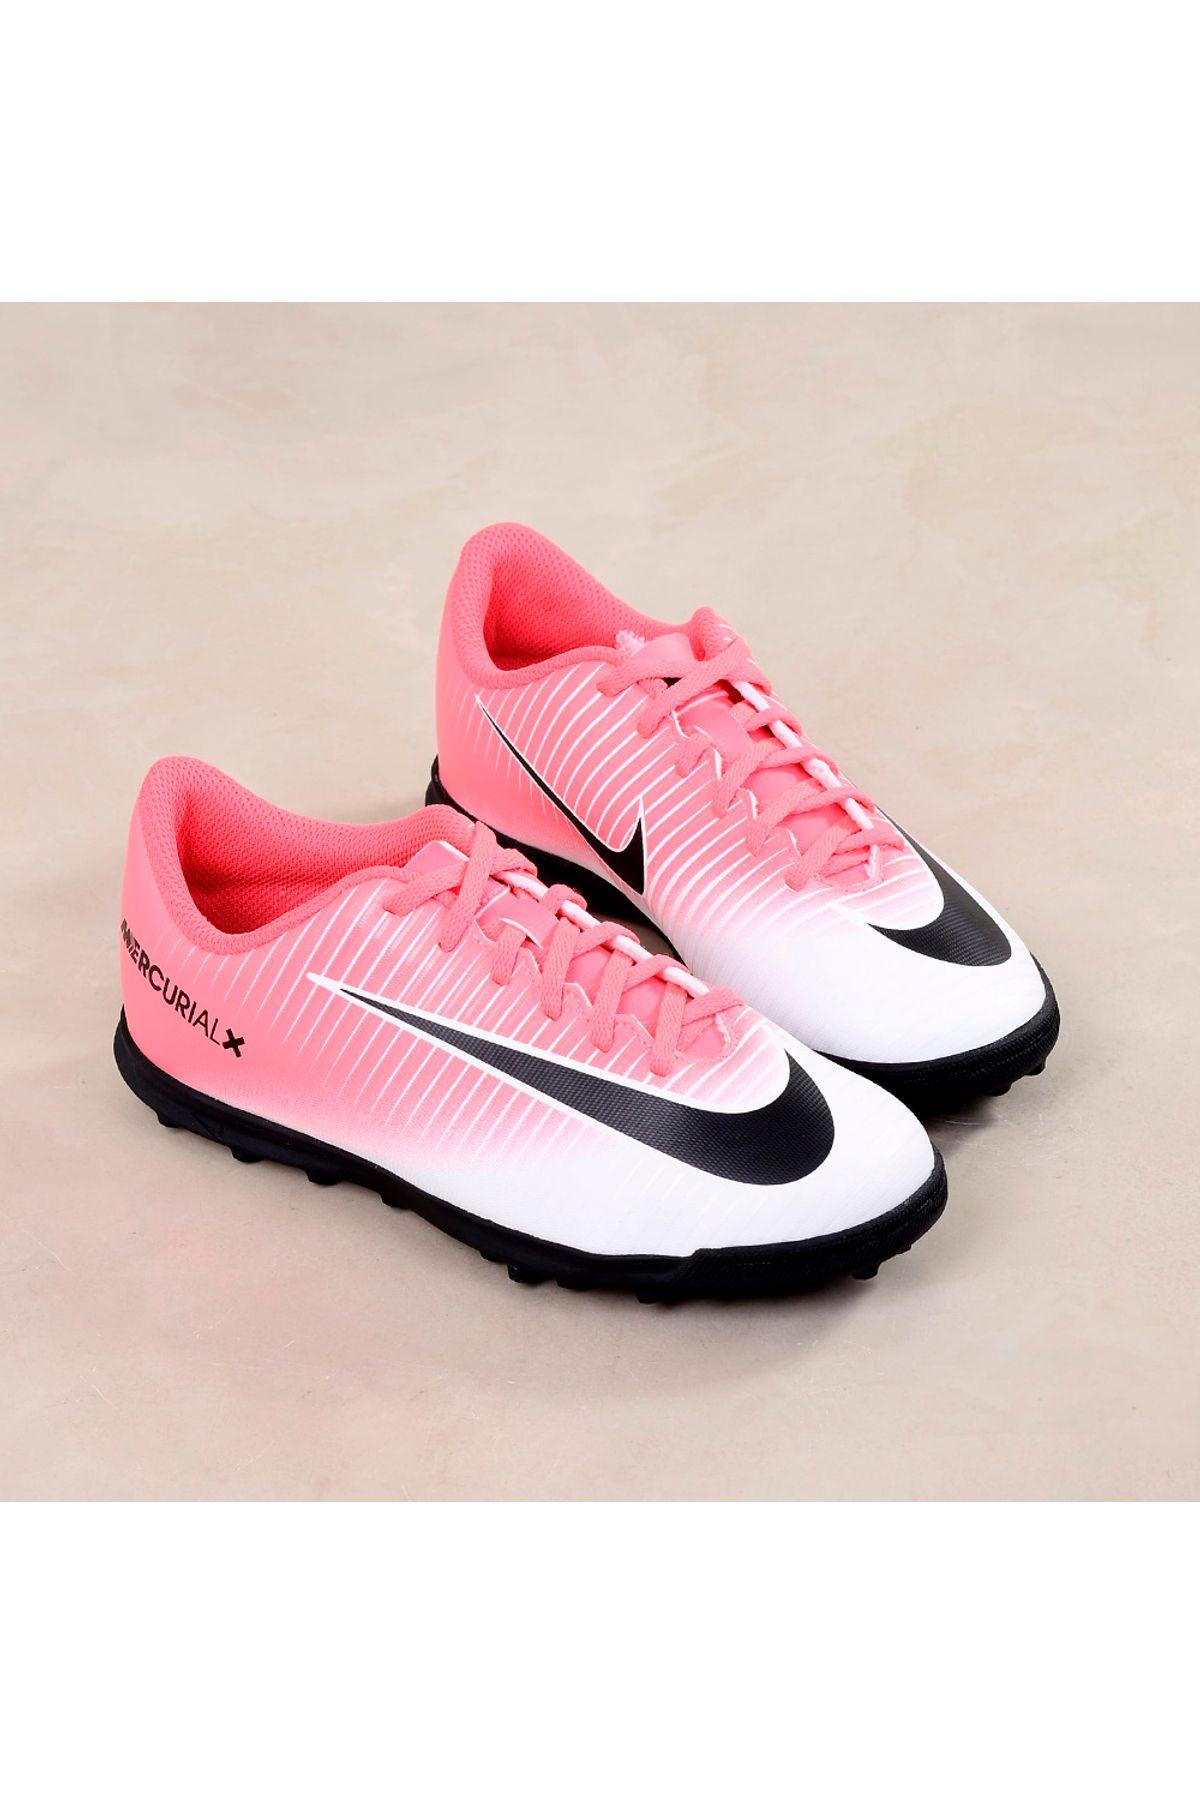 b2fe4d08a9 Chuteira Jr Nike Mercurial Vortex Iii